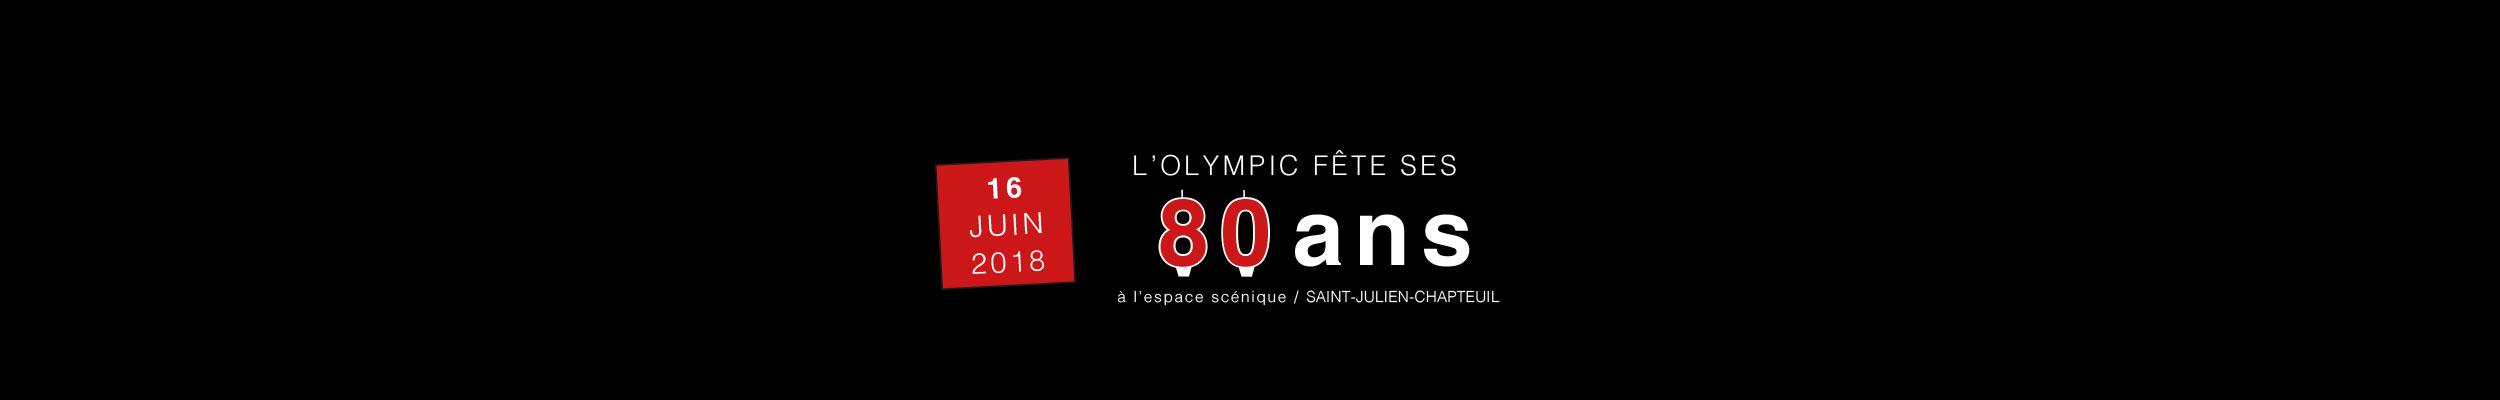 80ans de l'Olympic